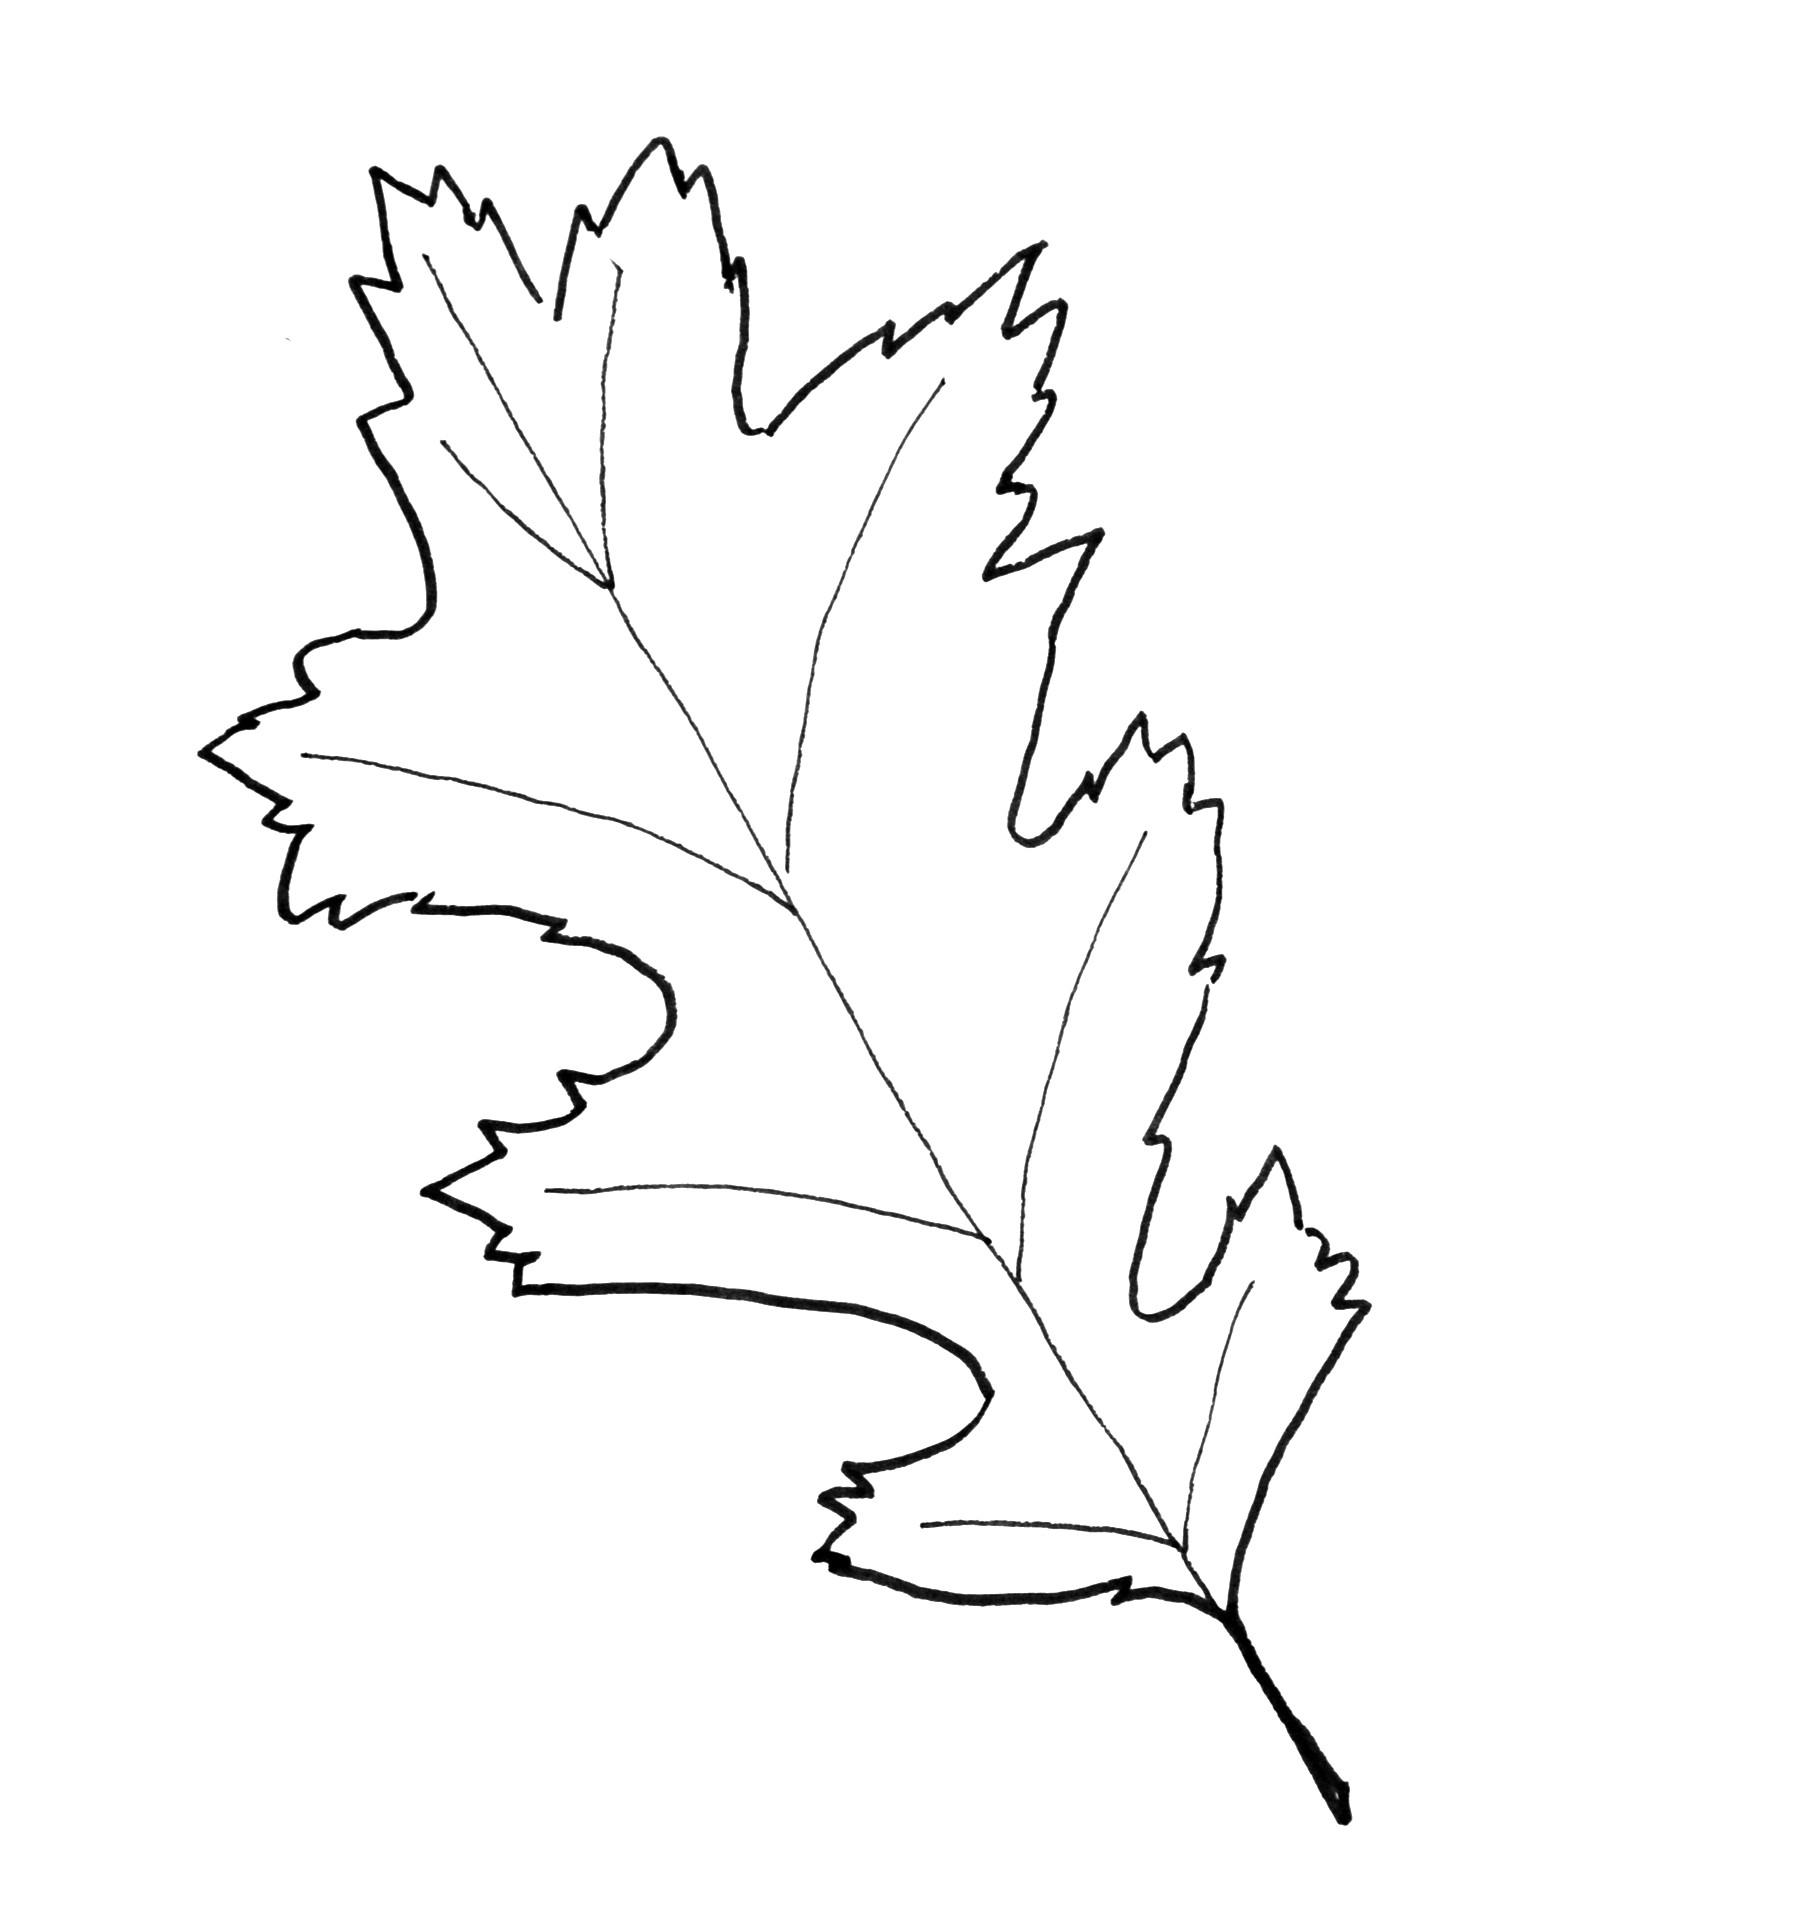 Fresh Printable Leaf Pattern Interesting Templates Coloring Pages - Free Printable Oak Leaf Patterns